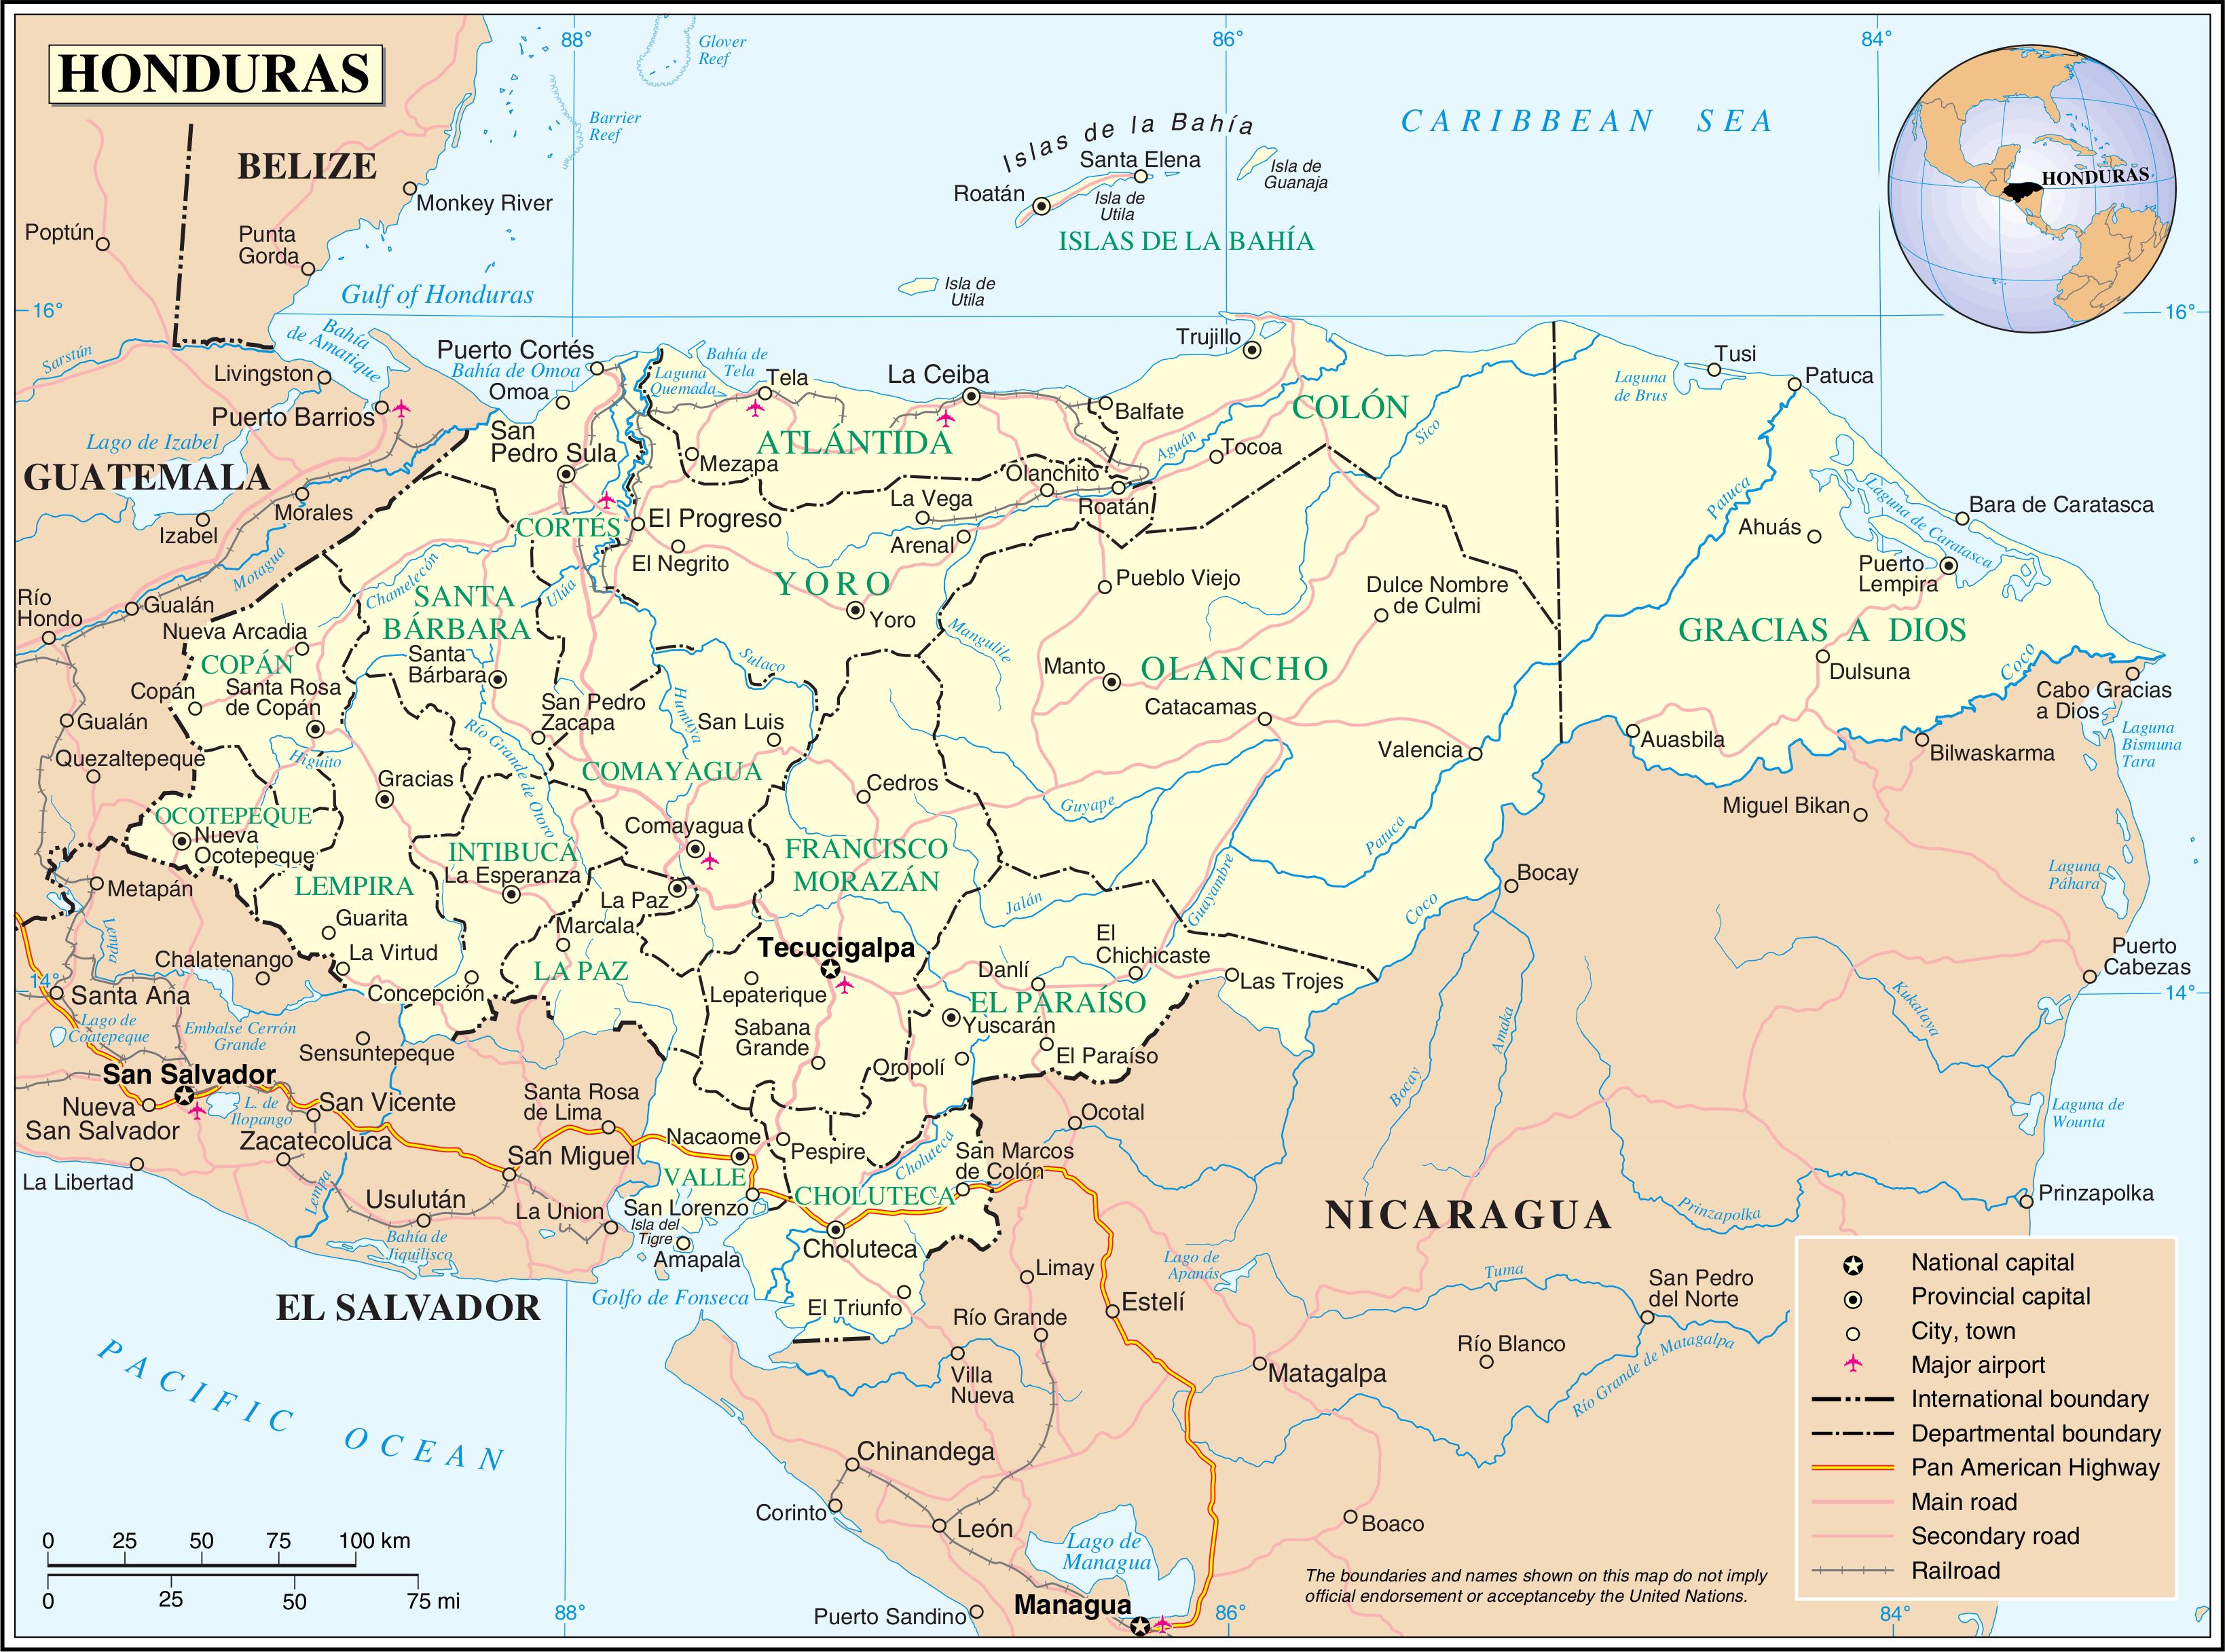 Archivo:Un-honduras.png - Wikipedia, la enciclopedia libre